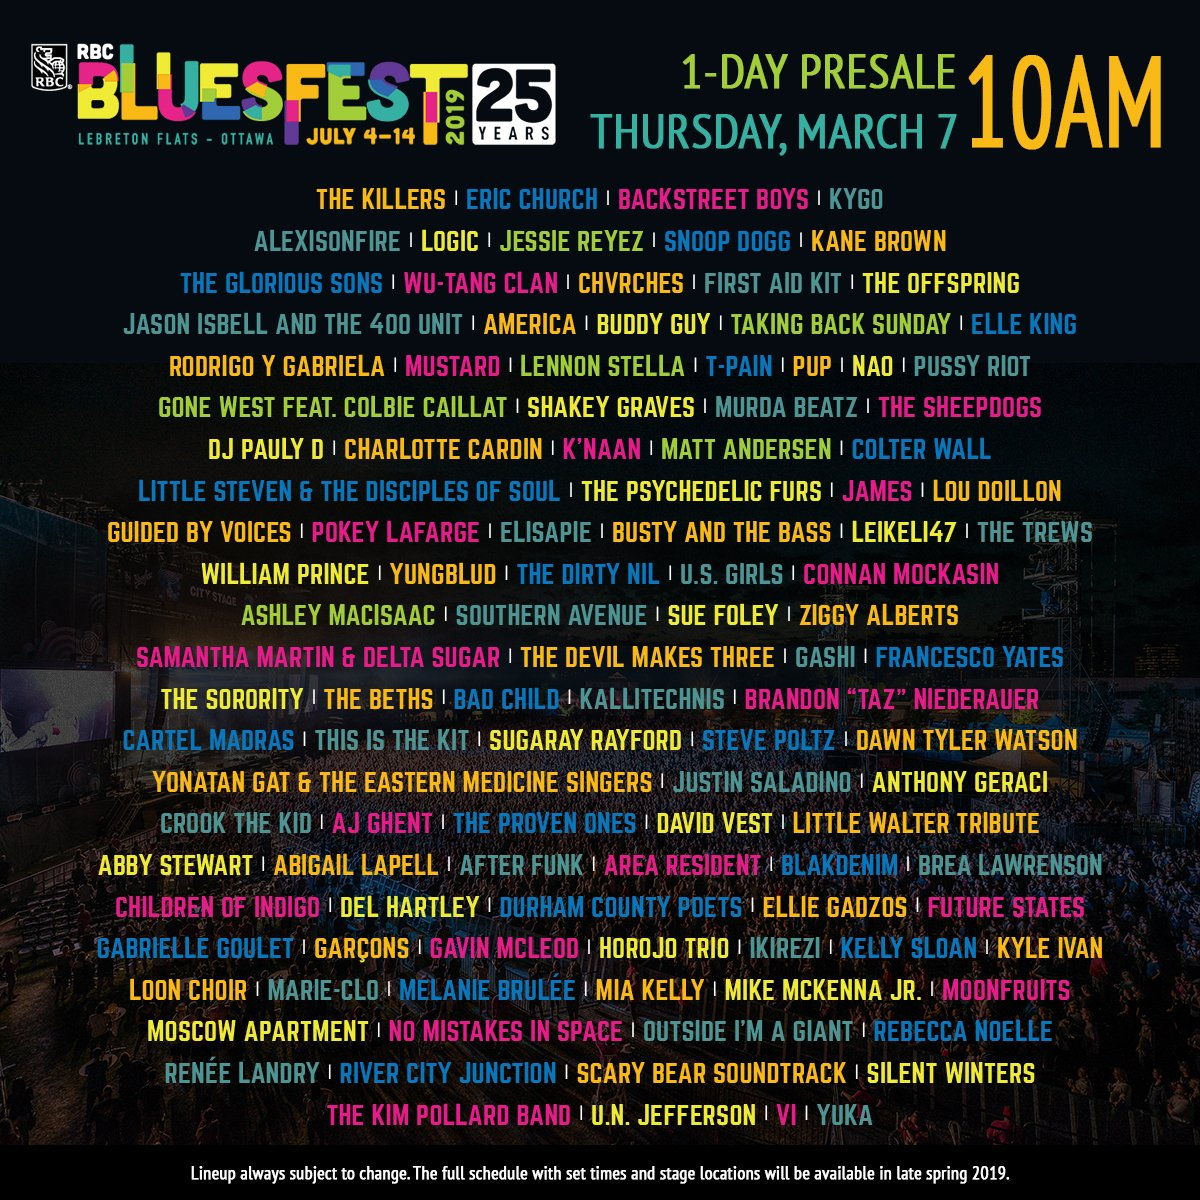 Rbc Bluesfest Announces Long Anticipated 25th Anniversary